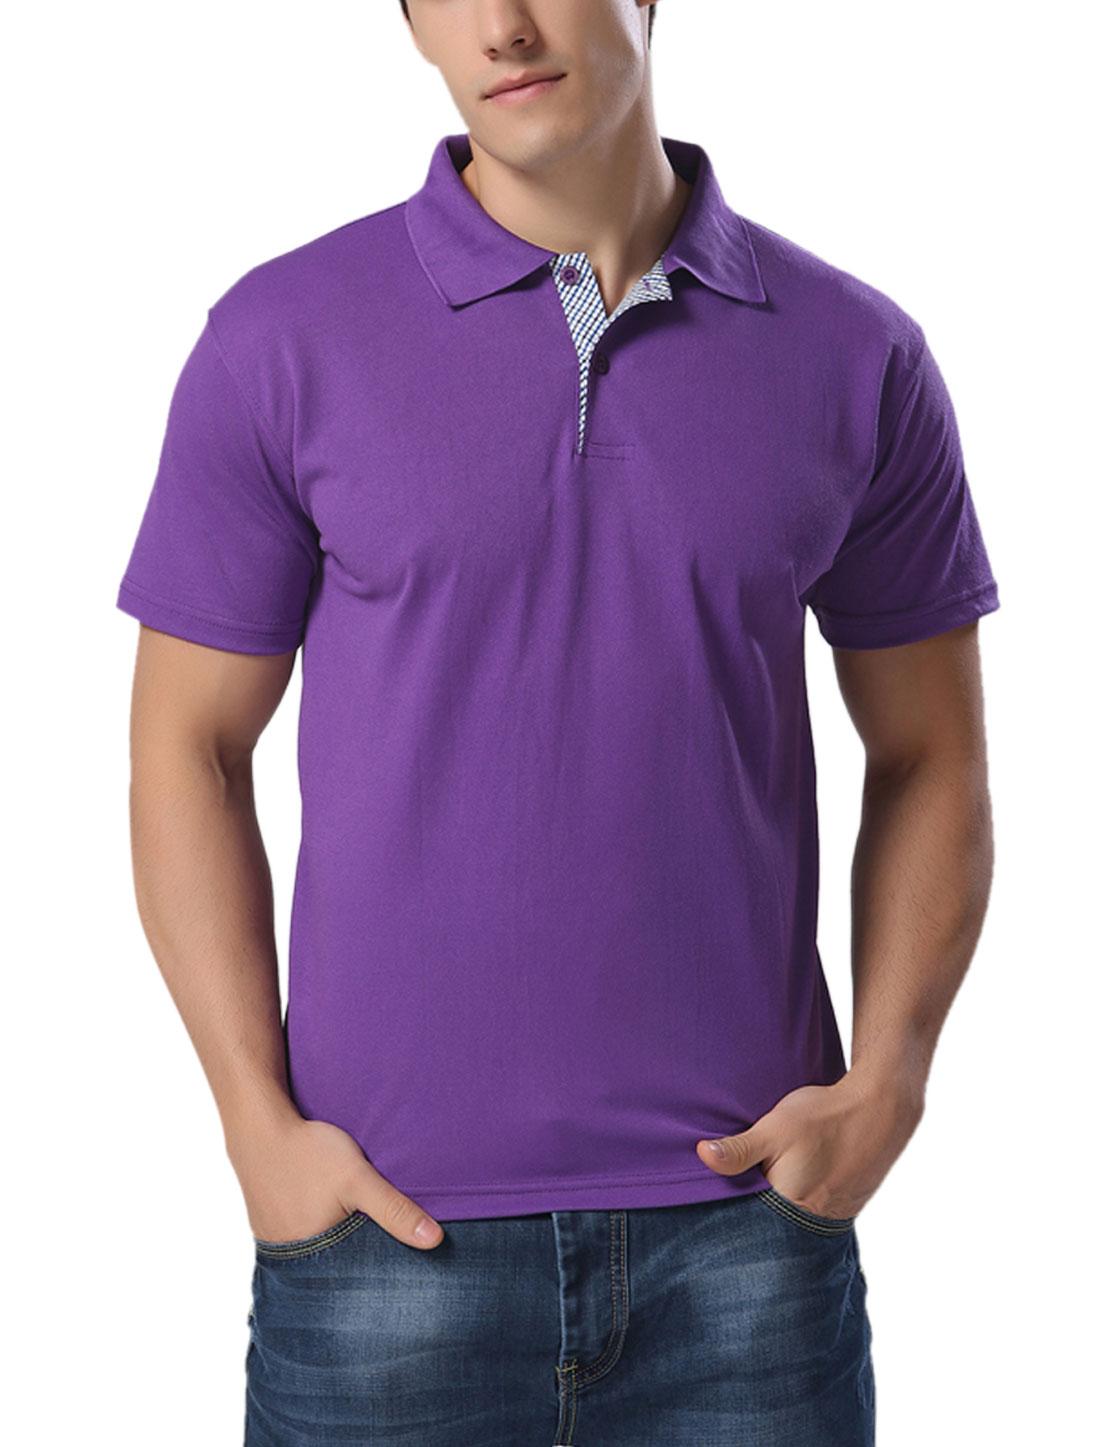 Man Short Sleeves Button Closed Sport Shirts Purple L